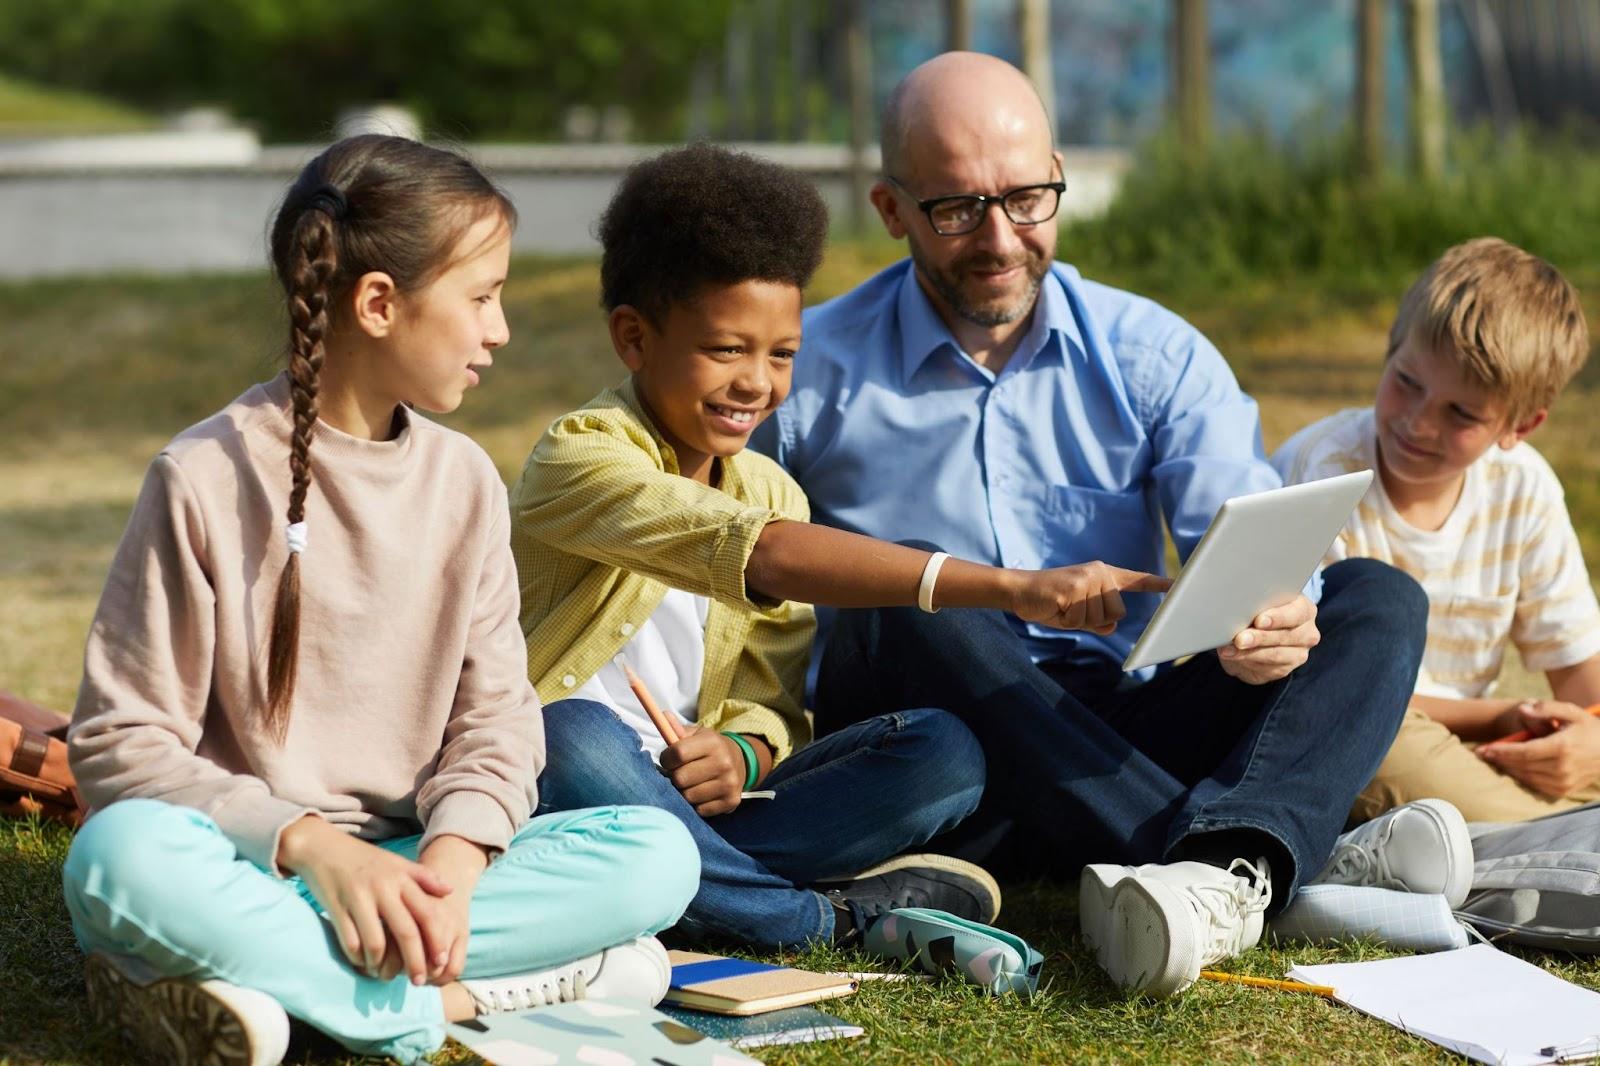 children-in-outdoor-class-with-teacher